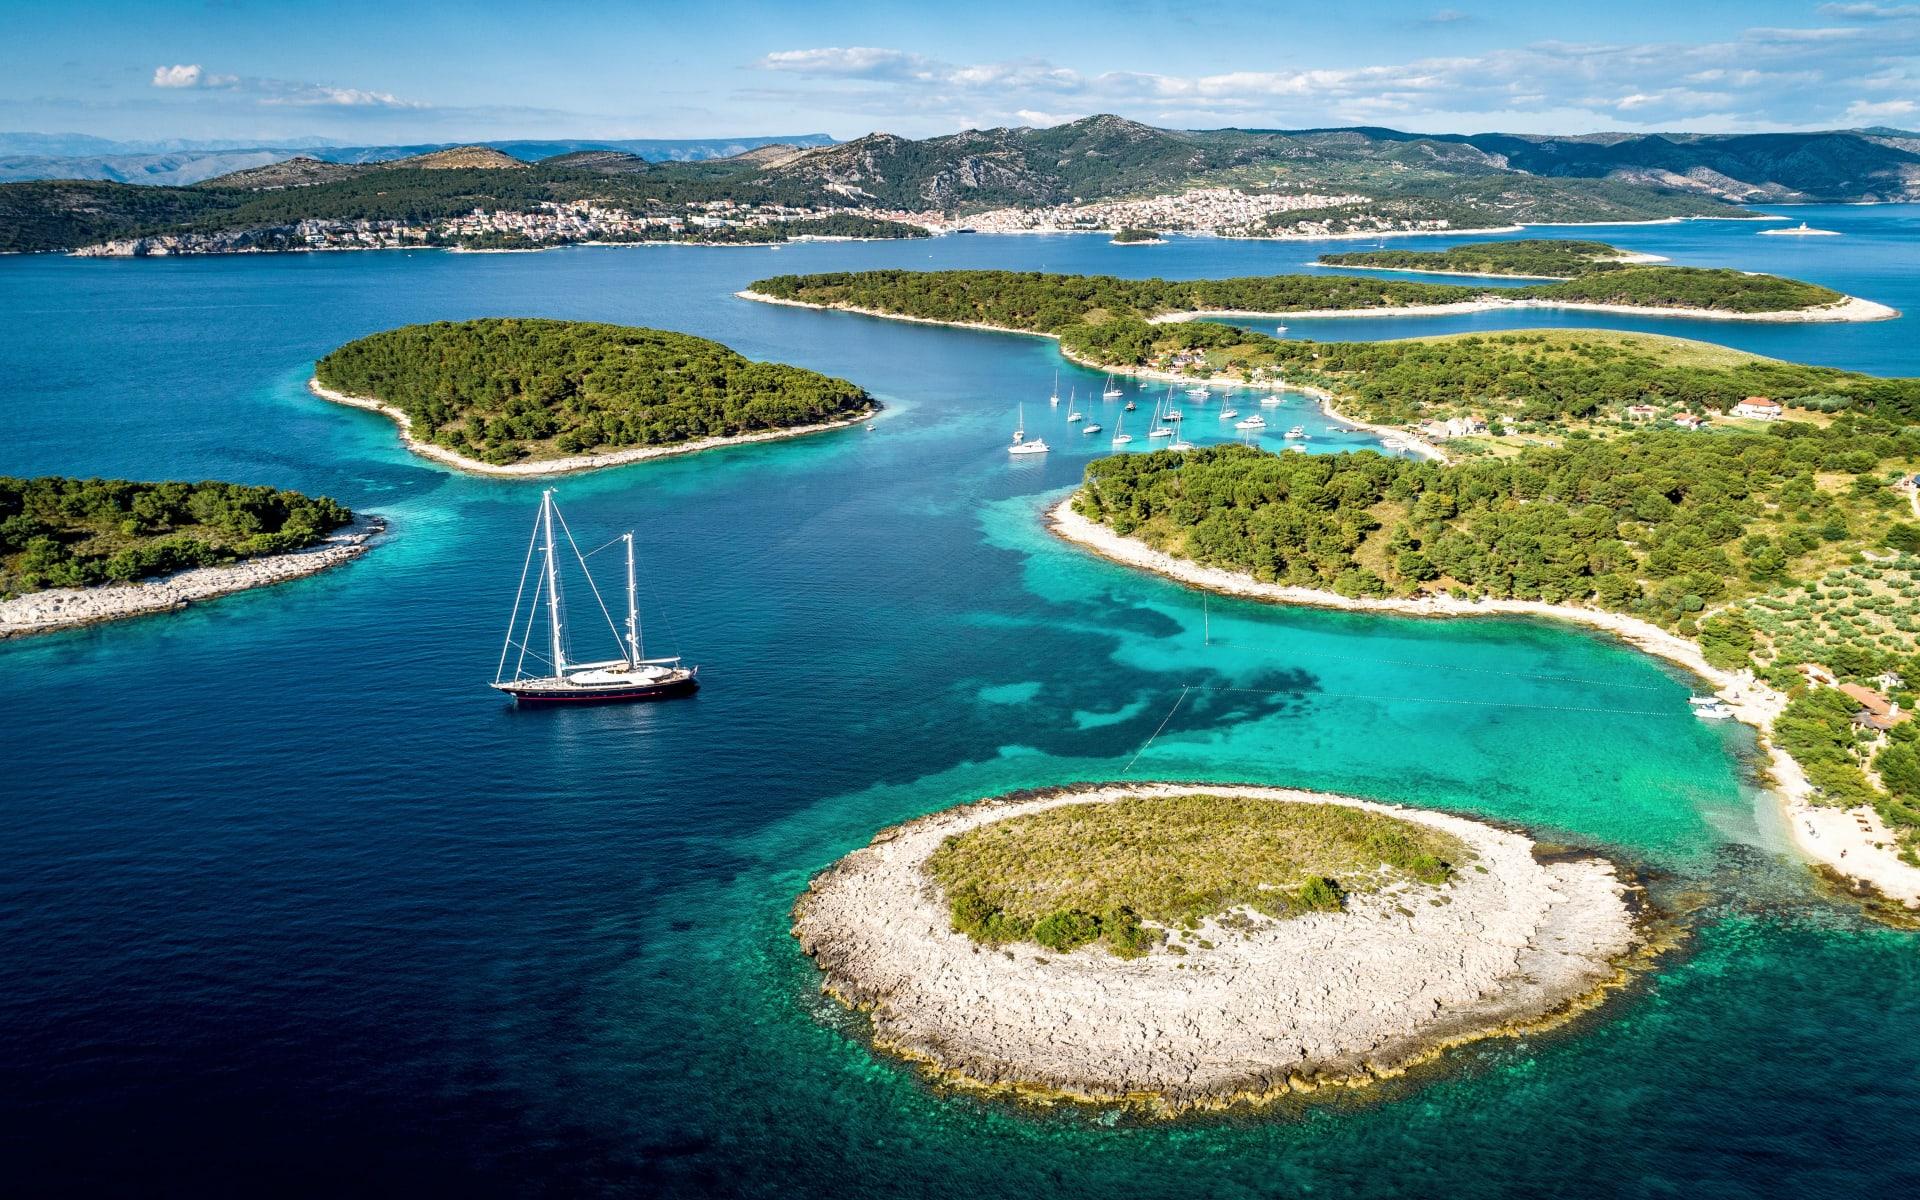 Badeferien im Maslina Resort ab Hvar: Hvar_Inseln_